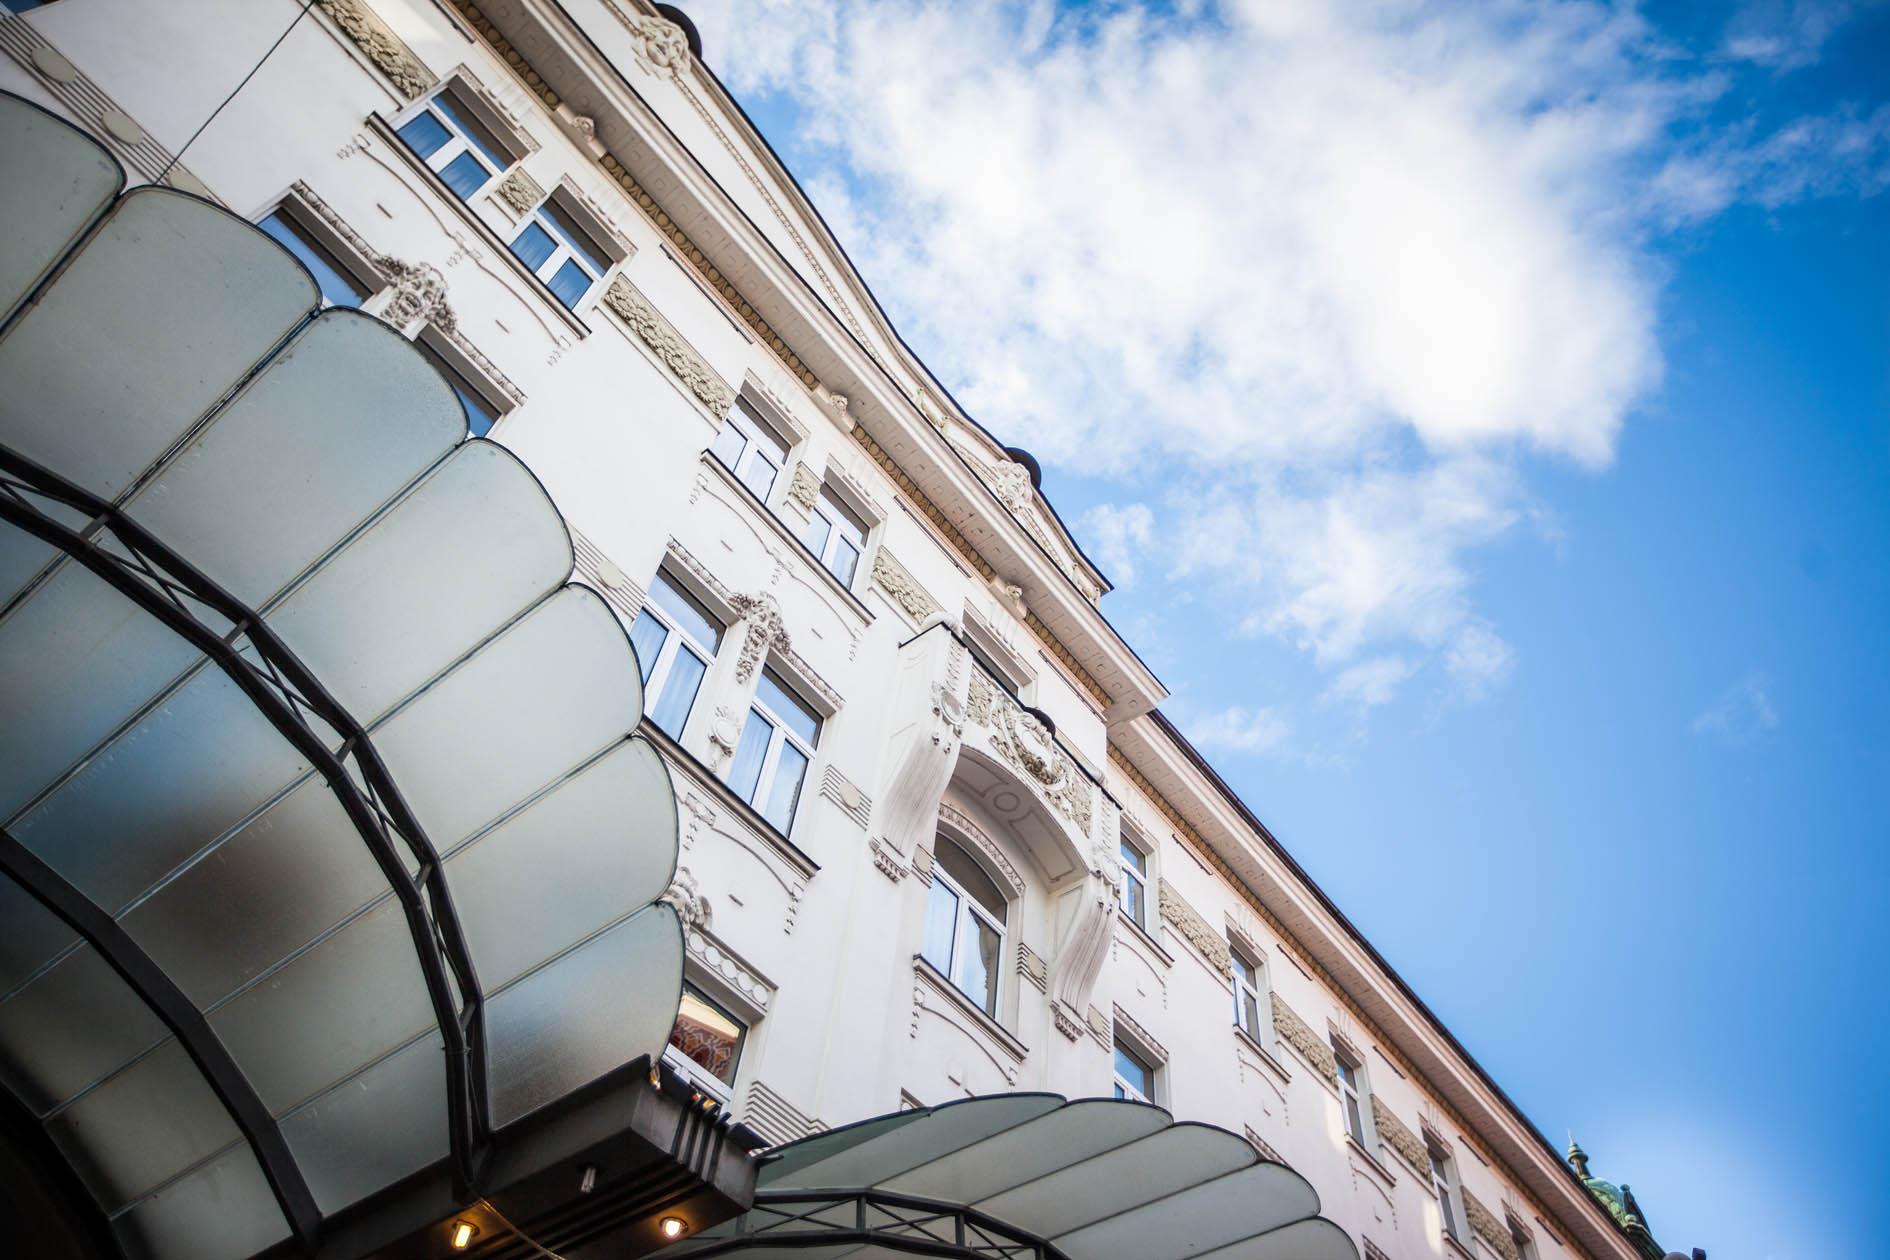 Façade from Grand Hotel Union in Ljubljana